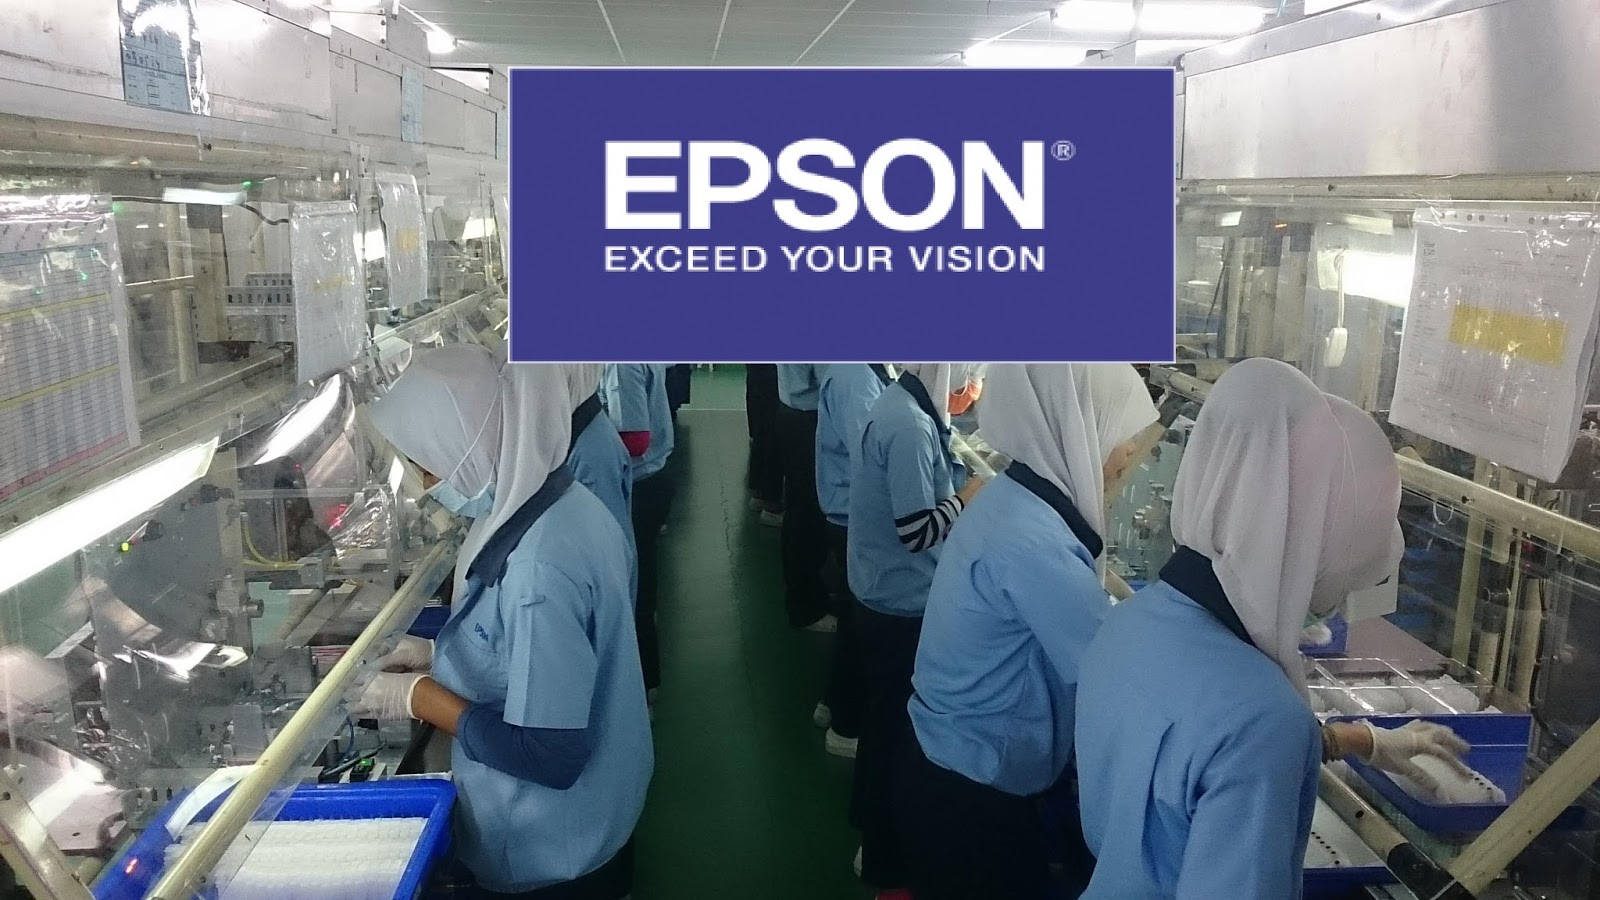 Loker Terbaru Epson Industry Cikarang - Lowongan PT Epson Indonesia Industry